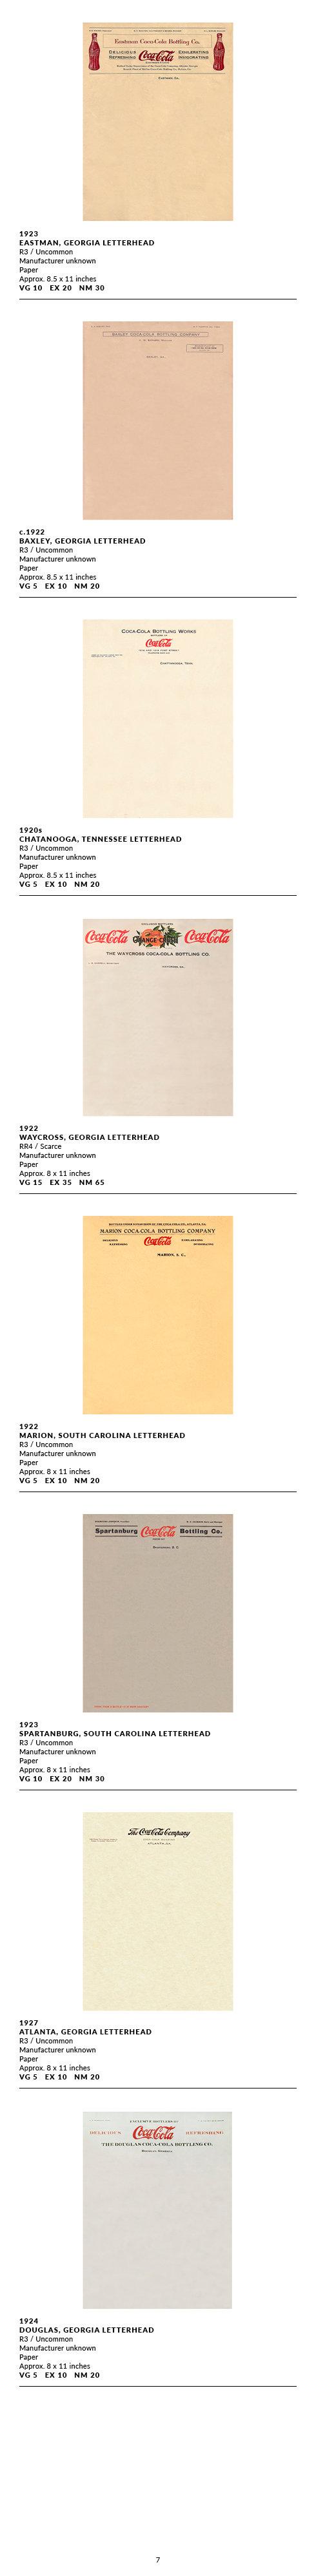 Letterhead7.jpg